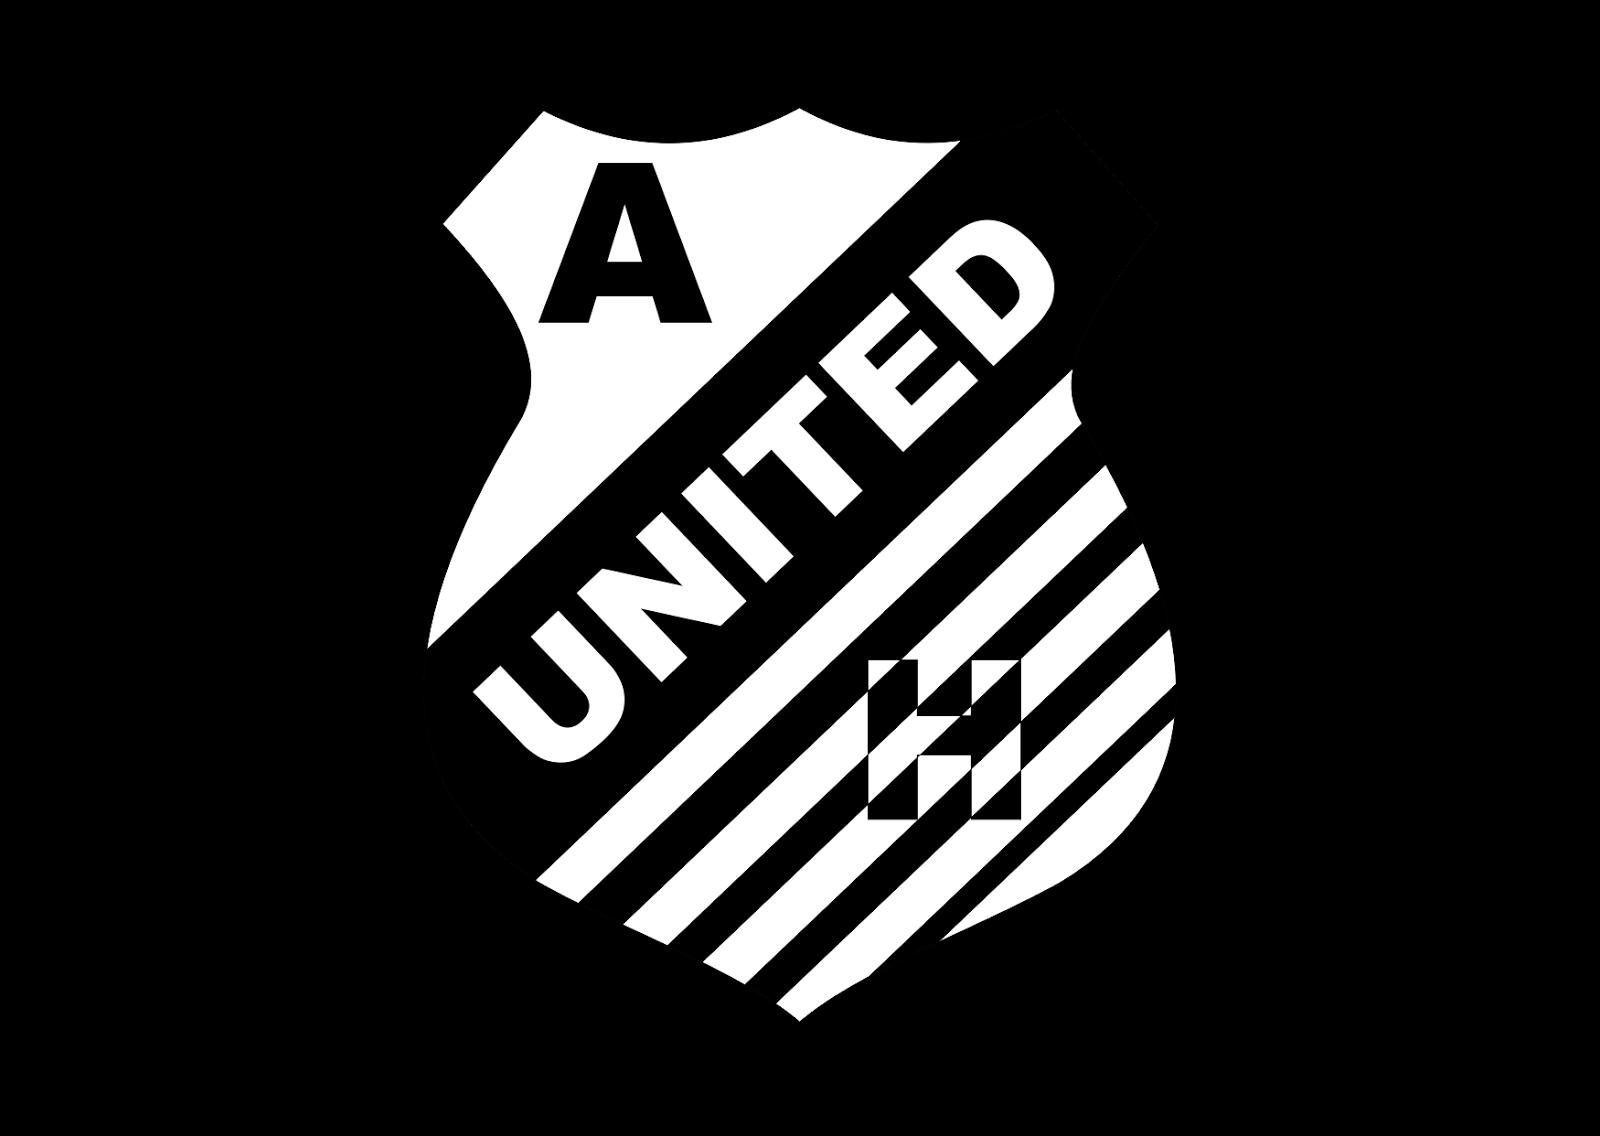 AH United Logo Vector ~ Format Cdr, Ai, Eps, Svg, PDF, PNG